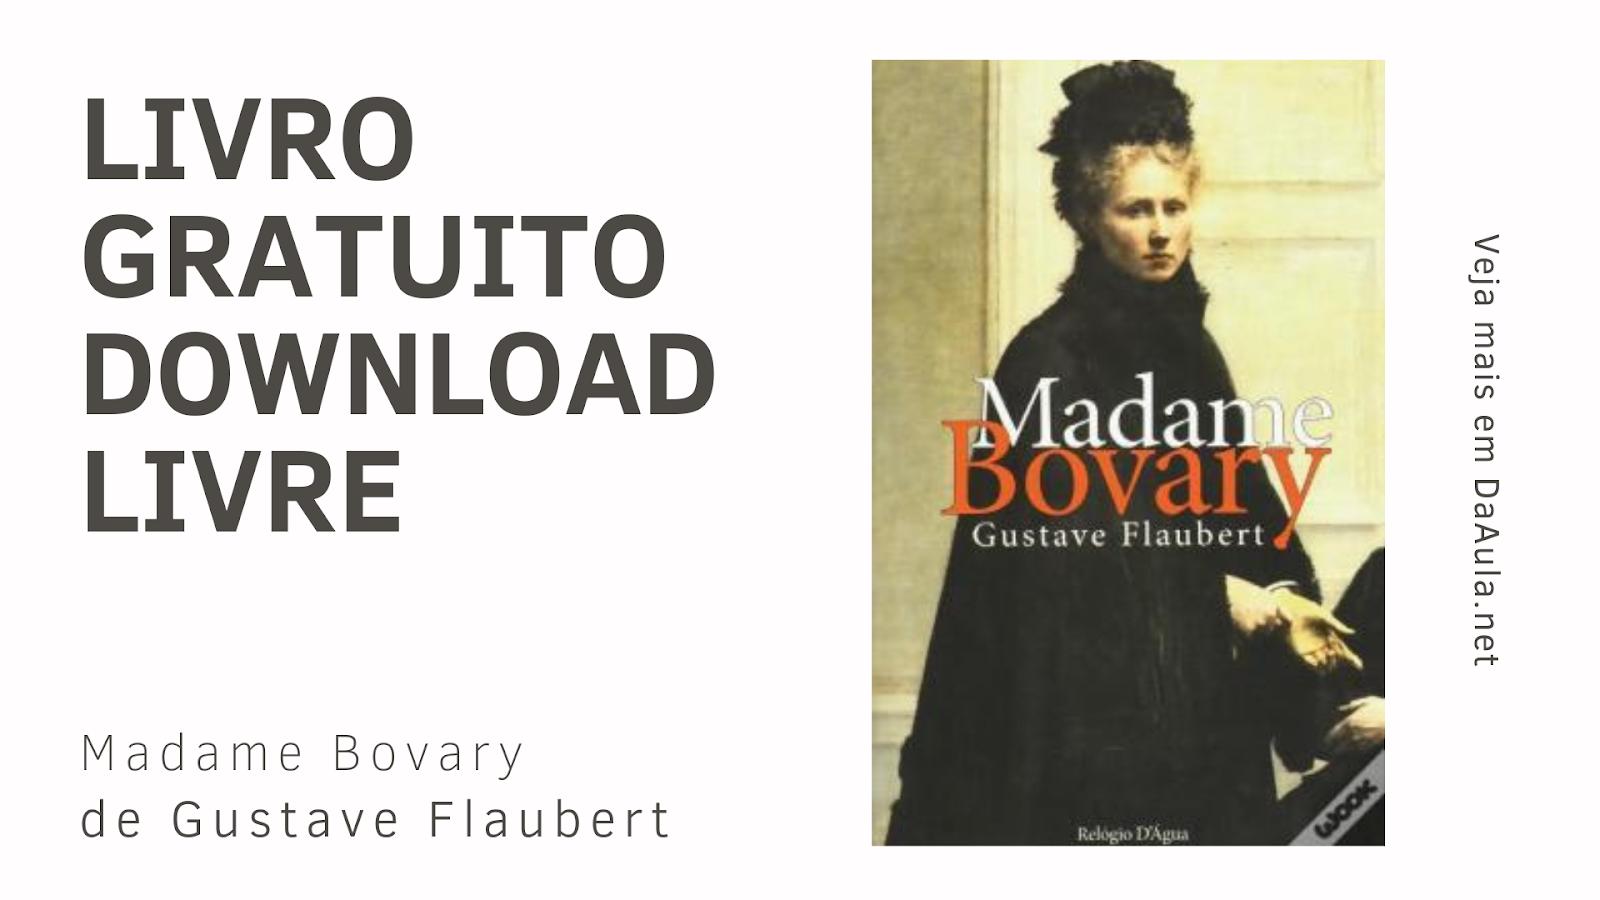 Livro: Madame Bovary de Gustave Flaubert